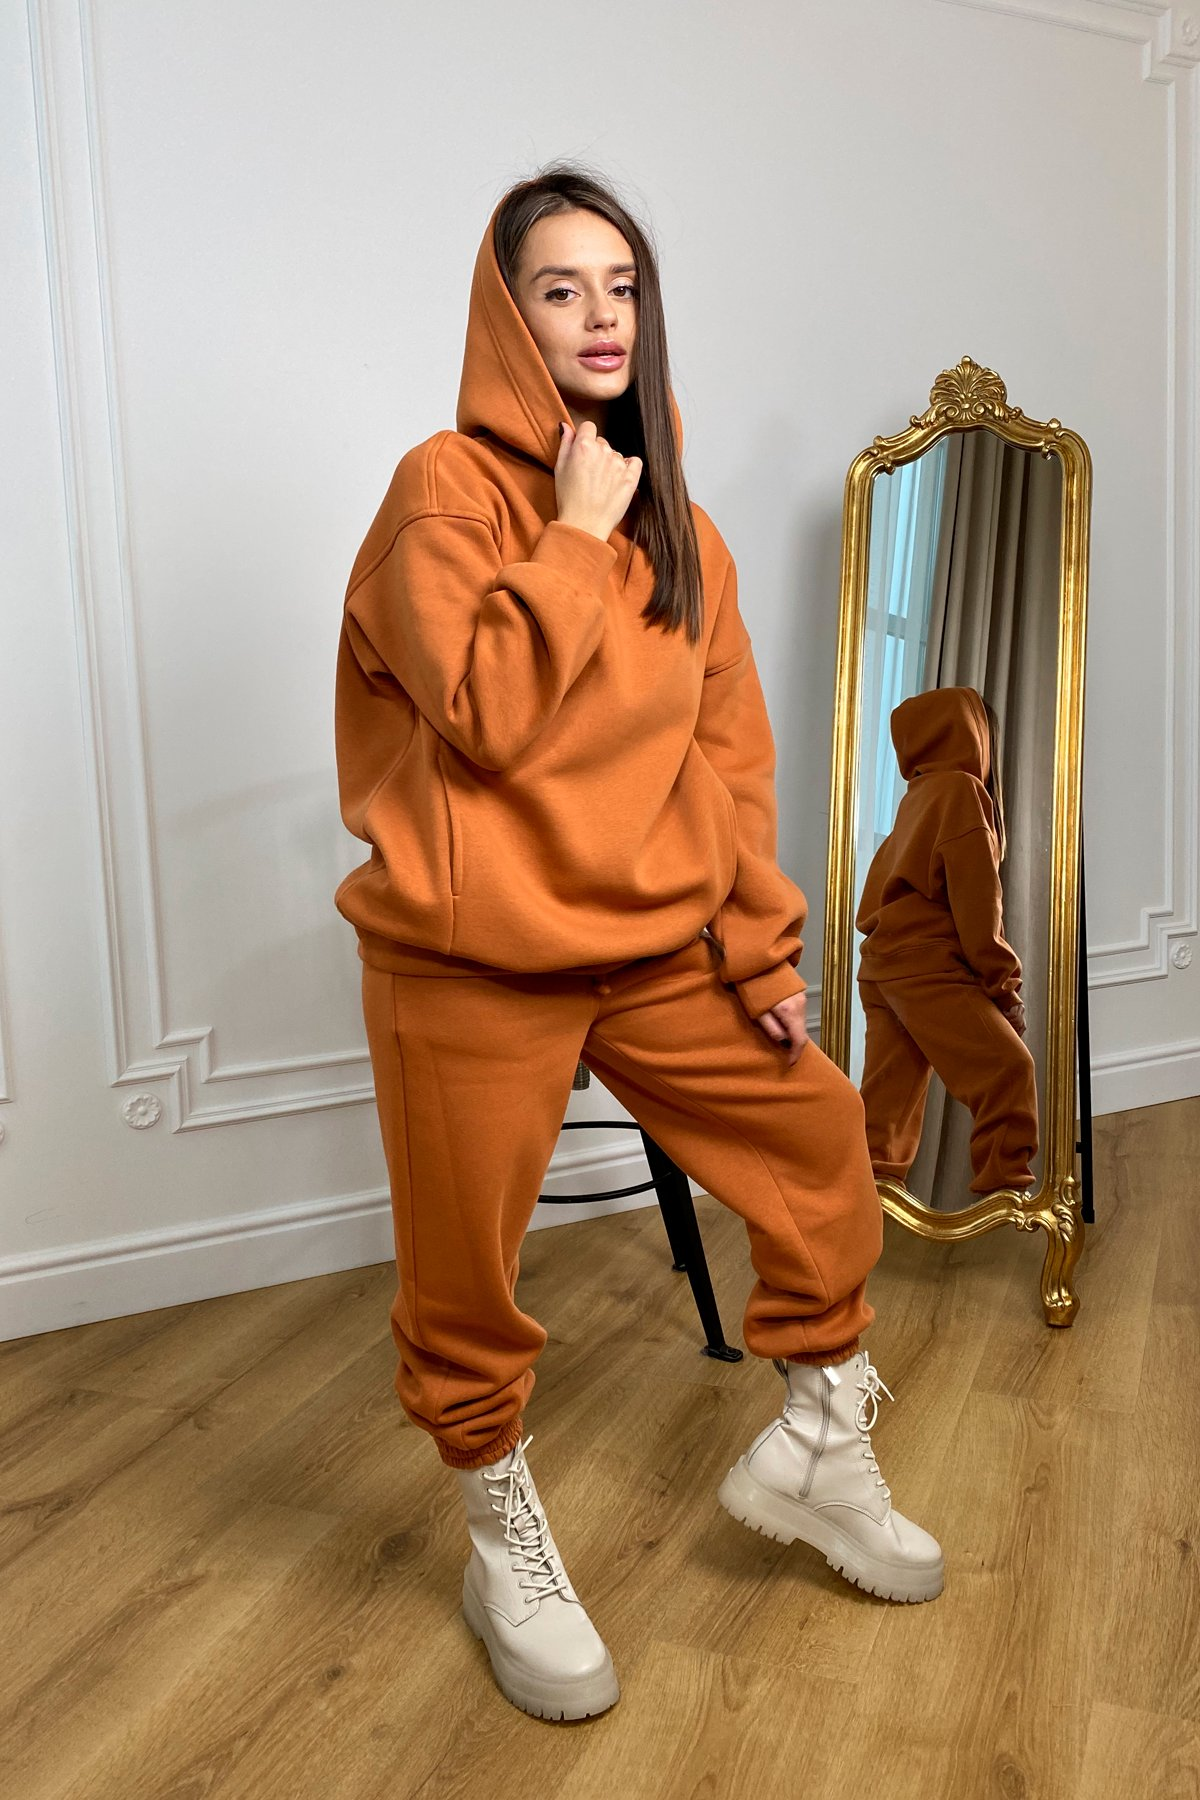 Марион костюм в  стиле Oversize  3х нитка 9651 АРТ. 46376 Цвет: Карамель/1 - фото 3, интернет магазин tm-modus.ru